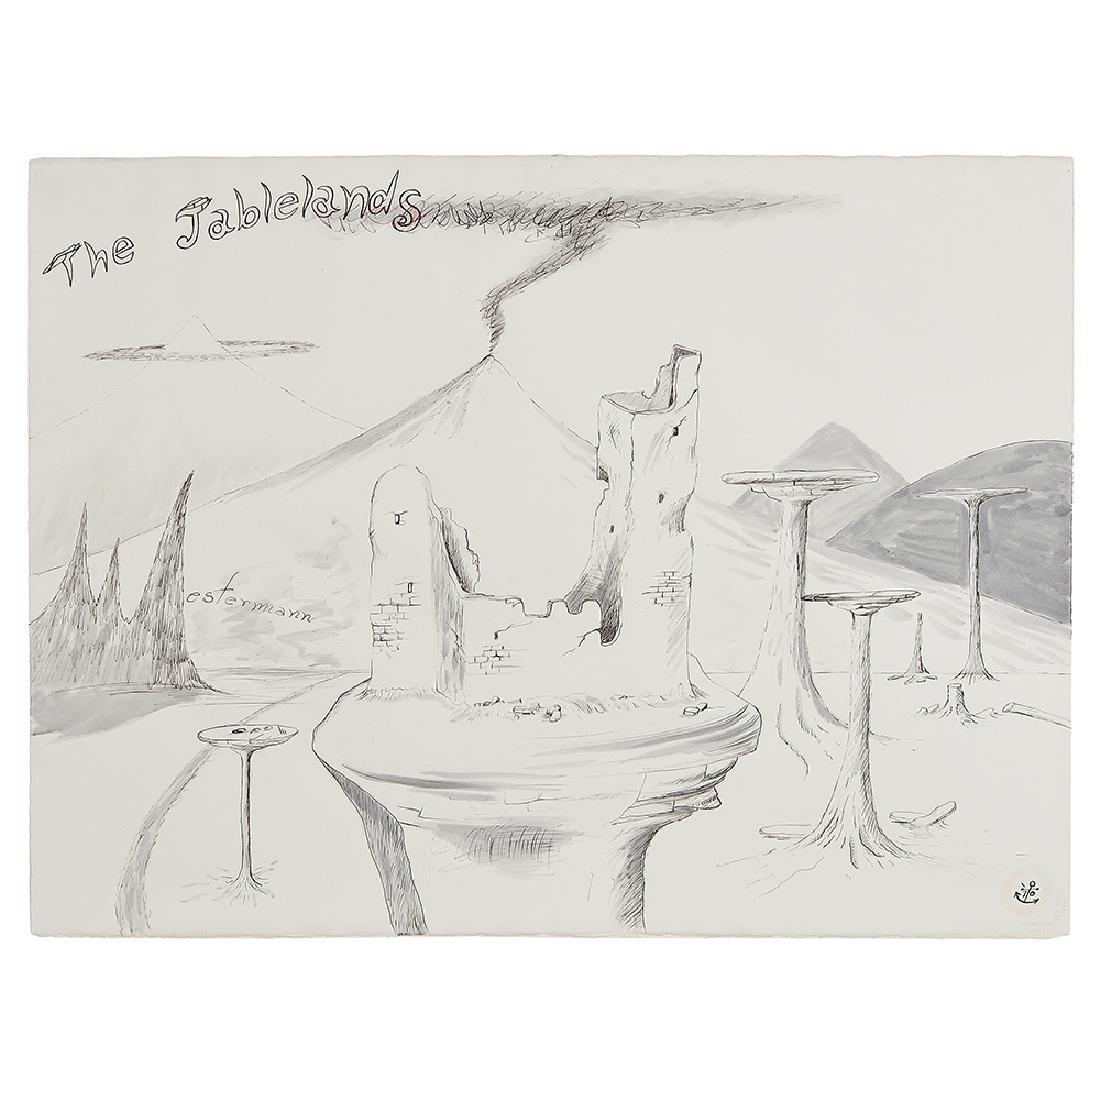 H.C. Westermann, The Tablelands, 1971